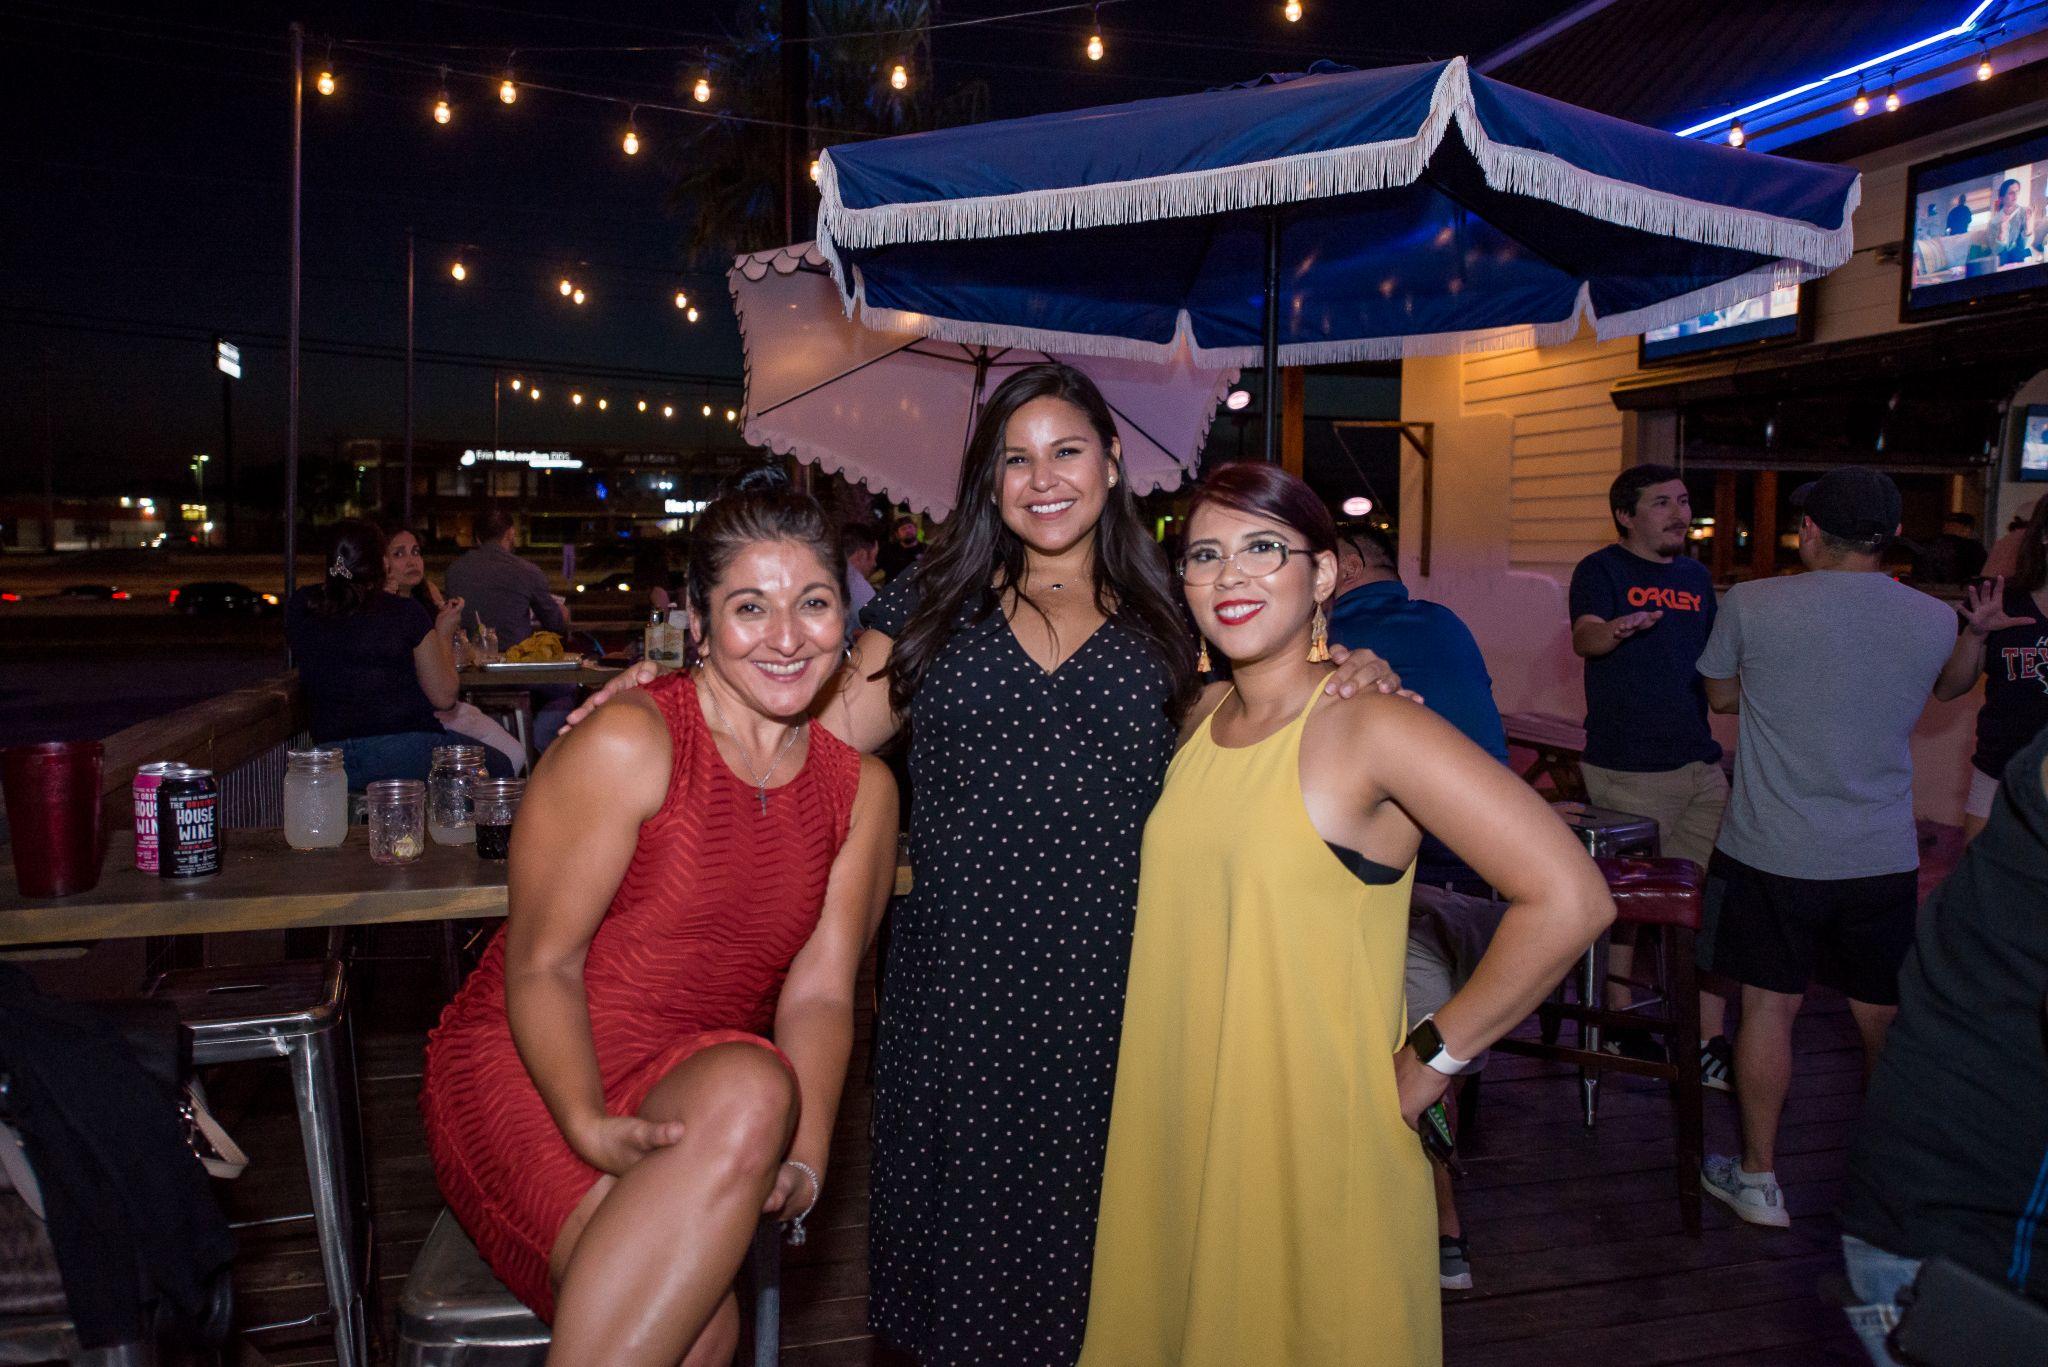 San Antonio ice house's new promotion is provocative, 'good adult fun'